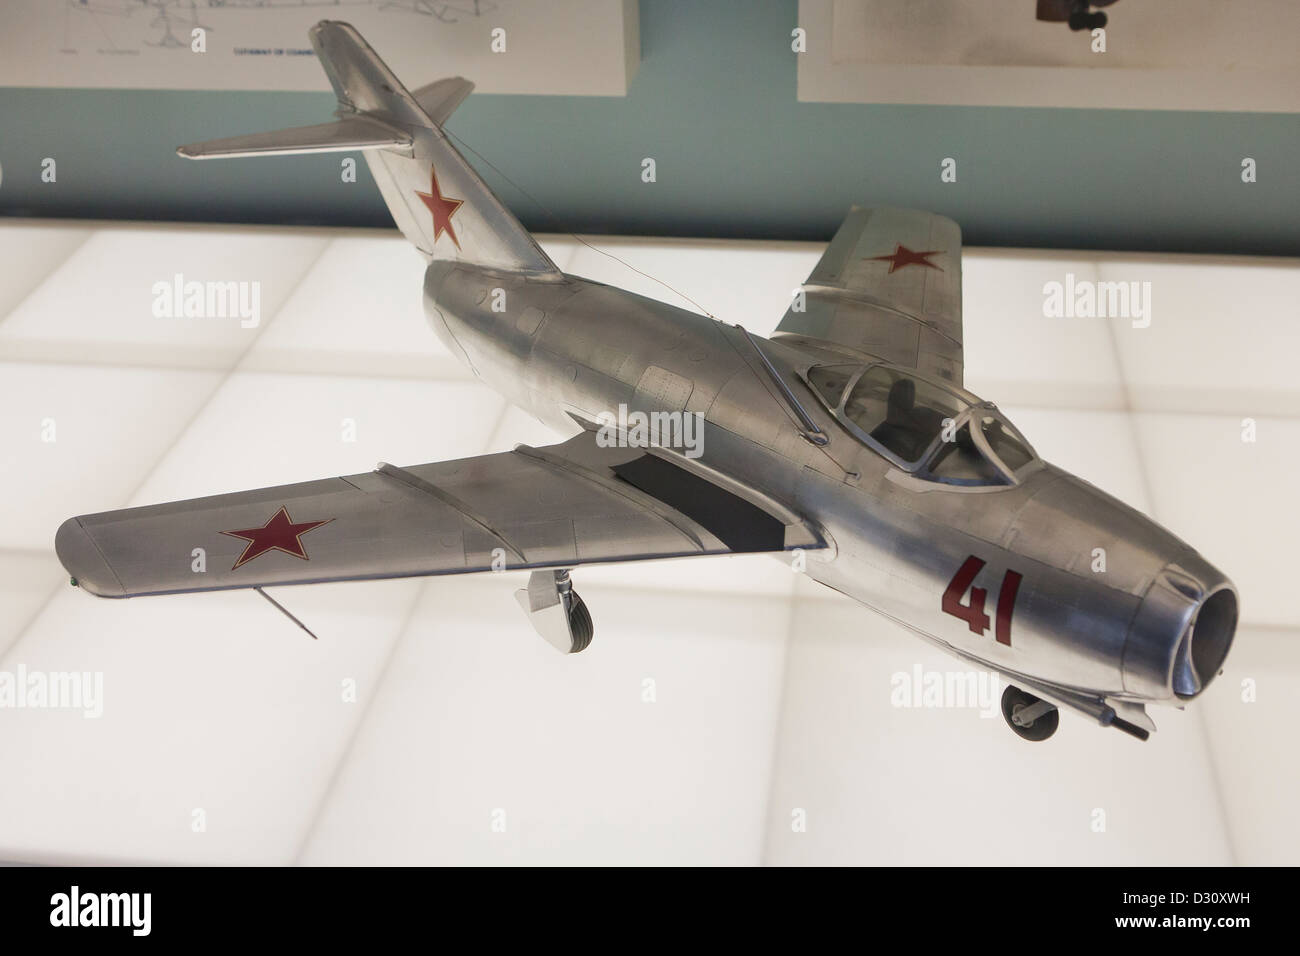 MiG-15 bis Soviet jet fighter aircraft model - Stock Image